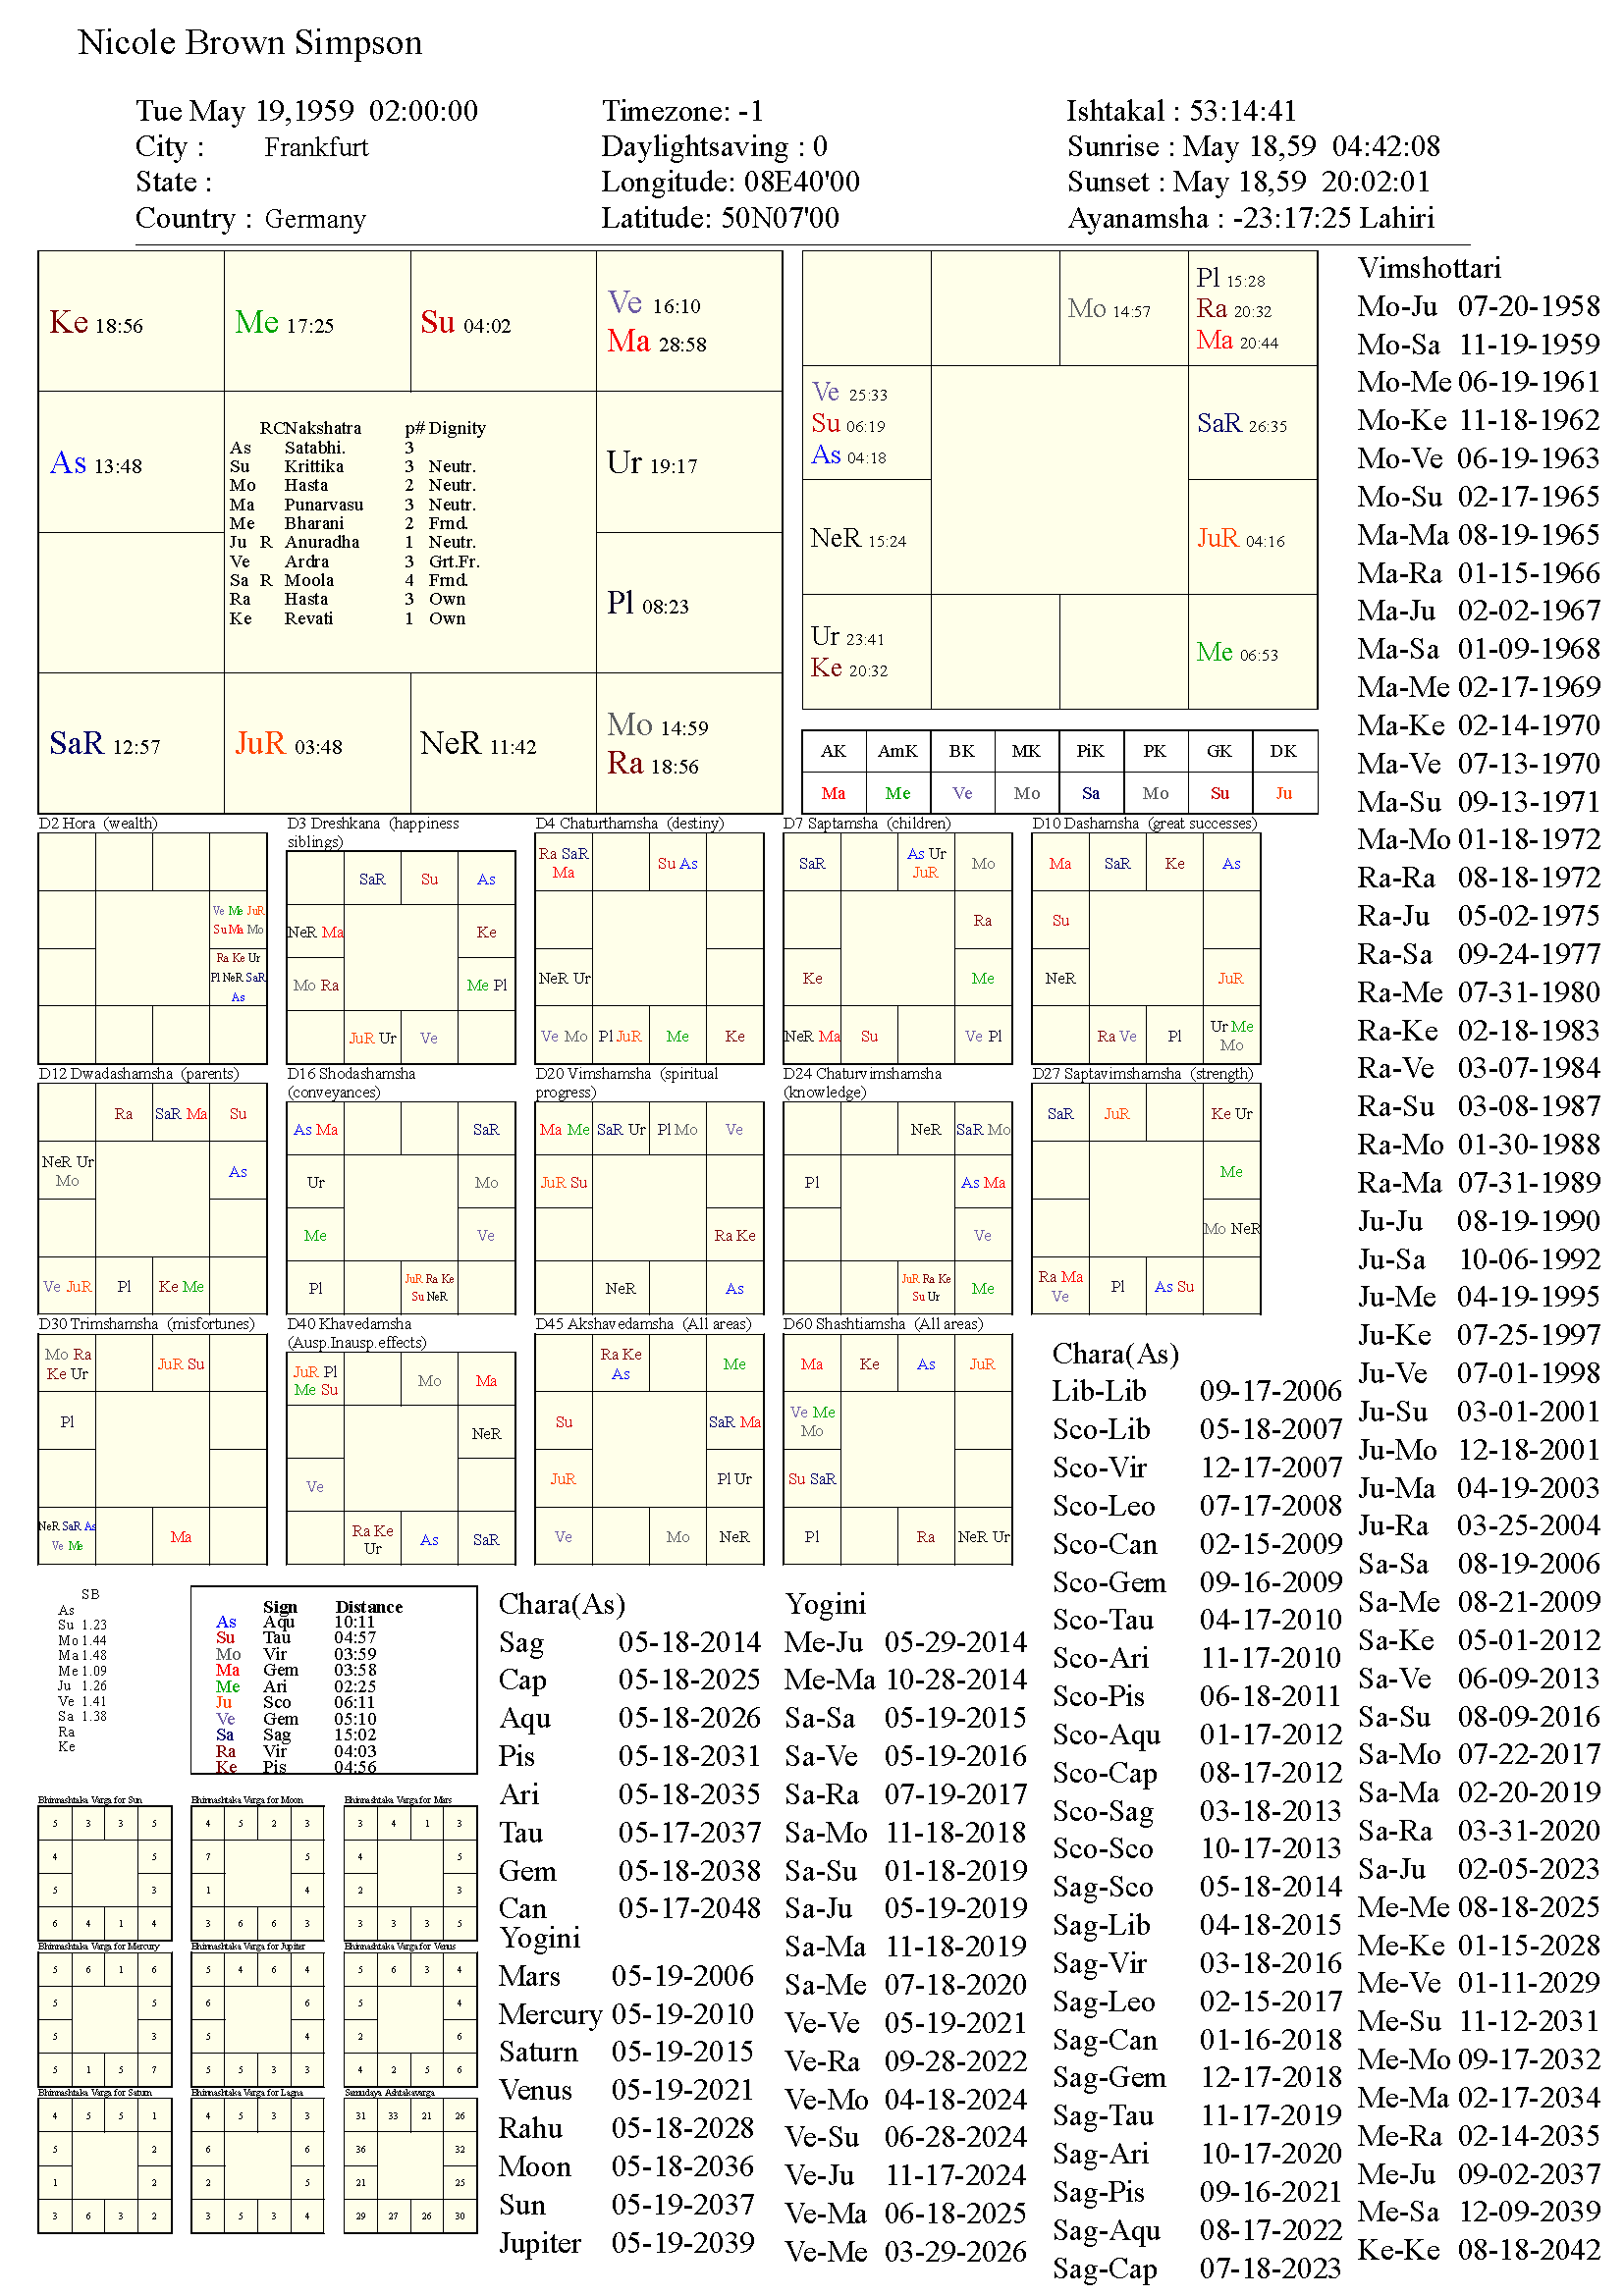 nicolebrownsimpson_chart